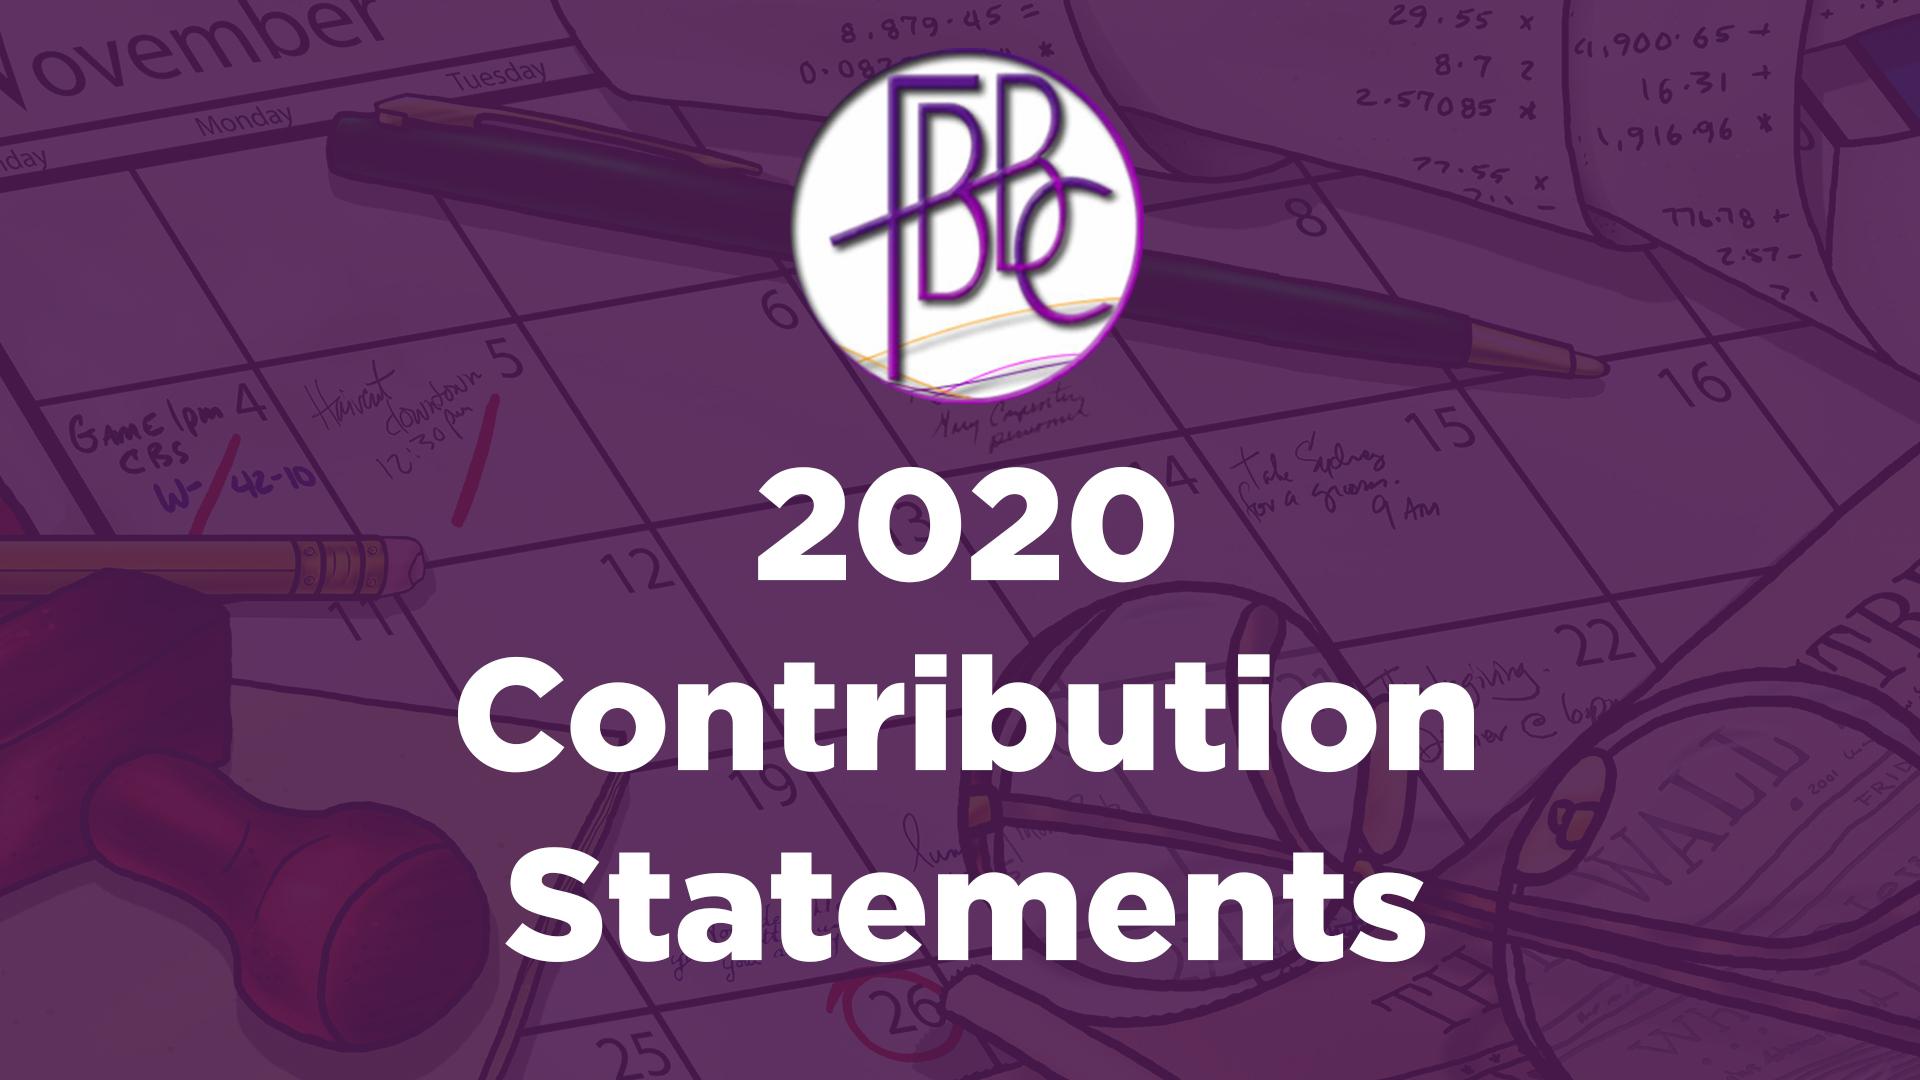 2020 Contribution Statements